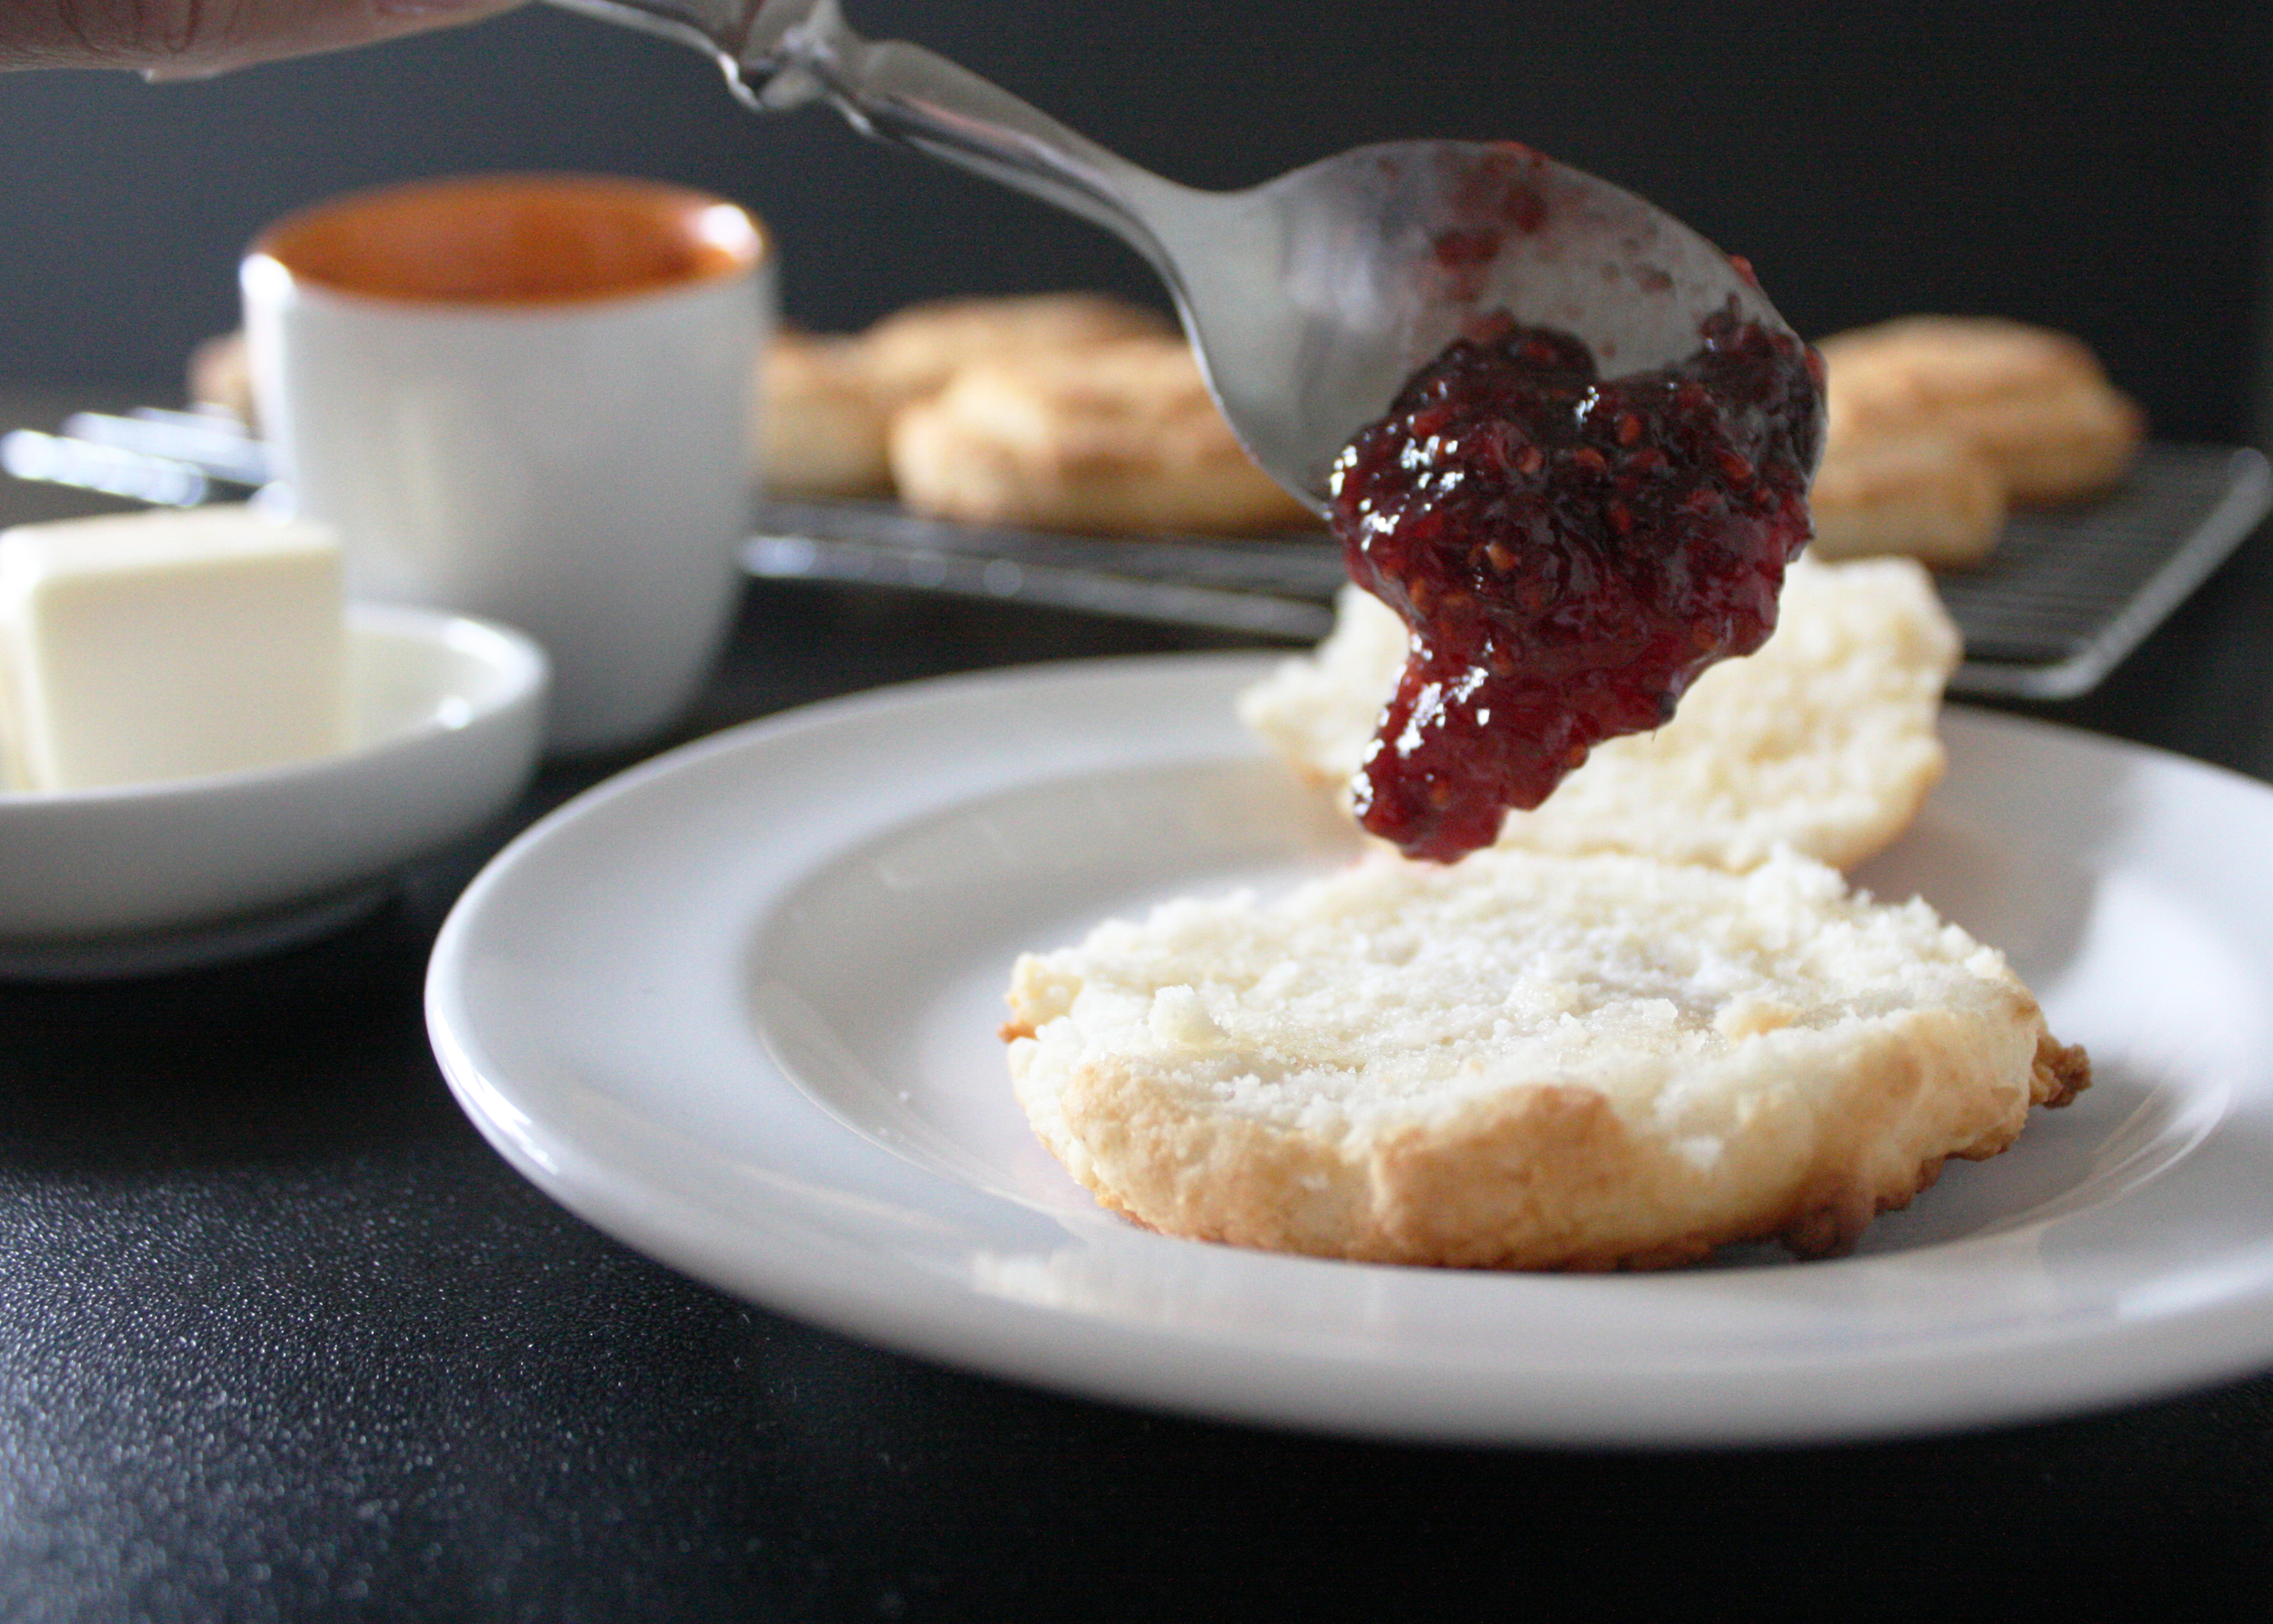 sam-c-perry-gluten-free-biscuits-jam.jpg